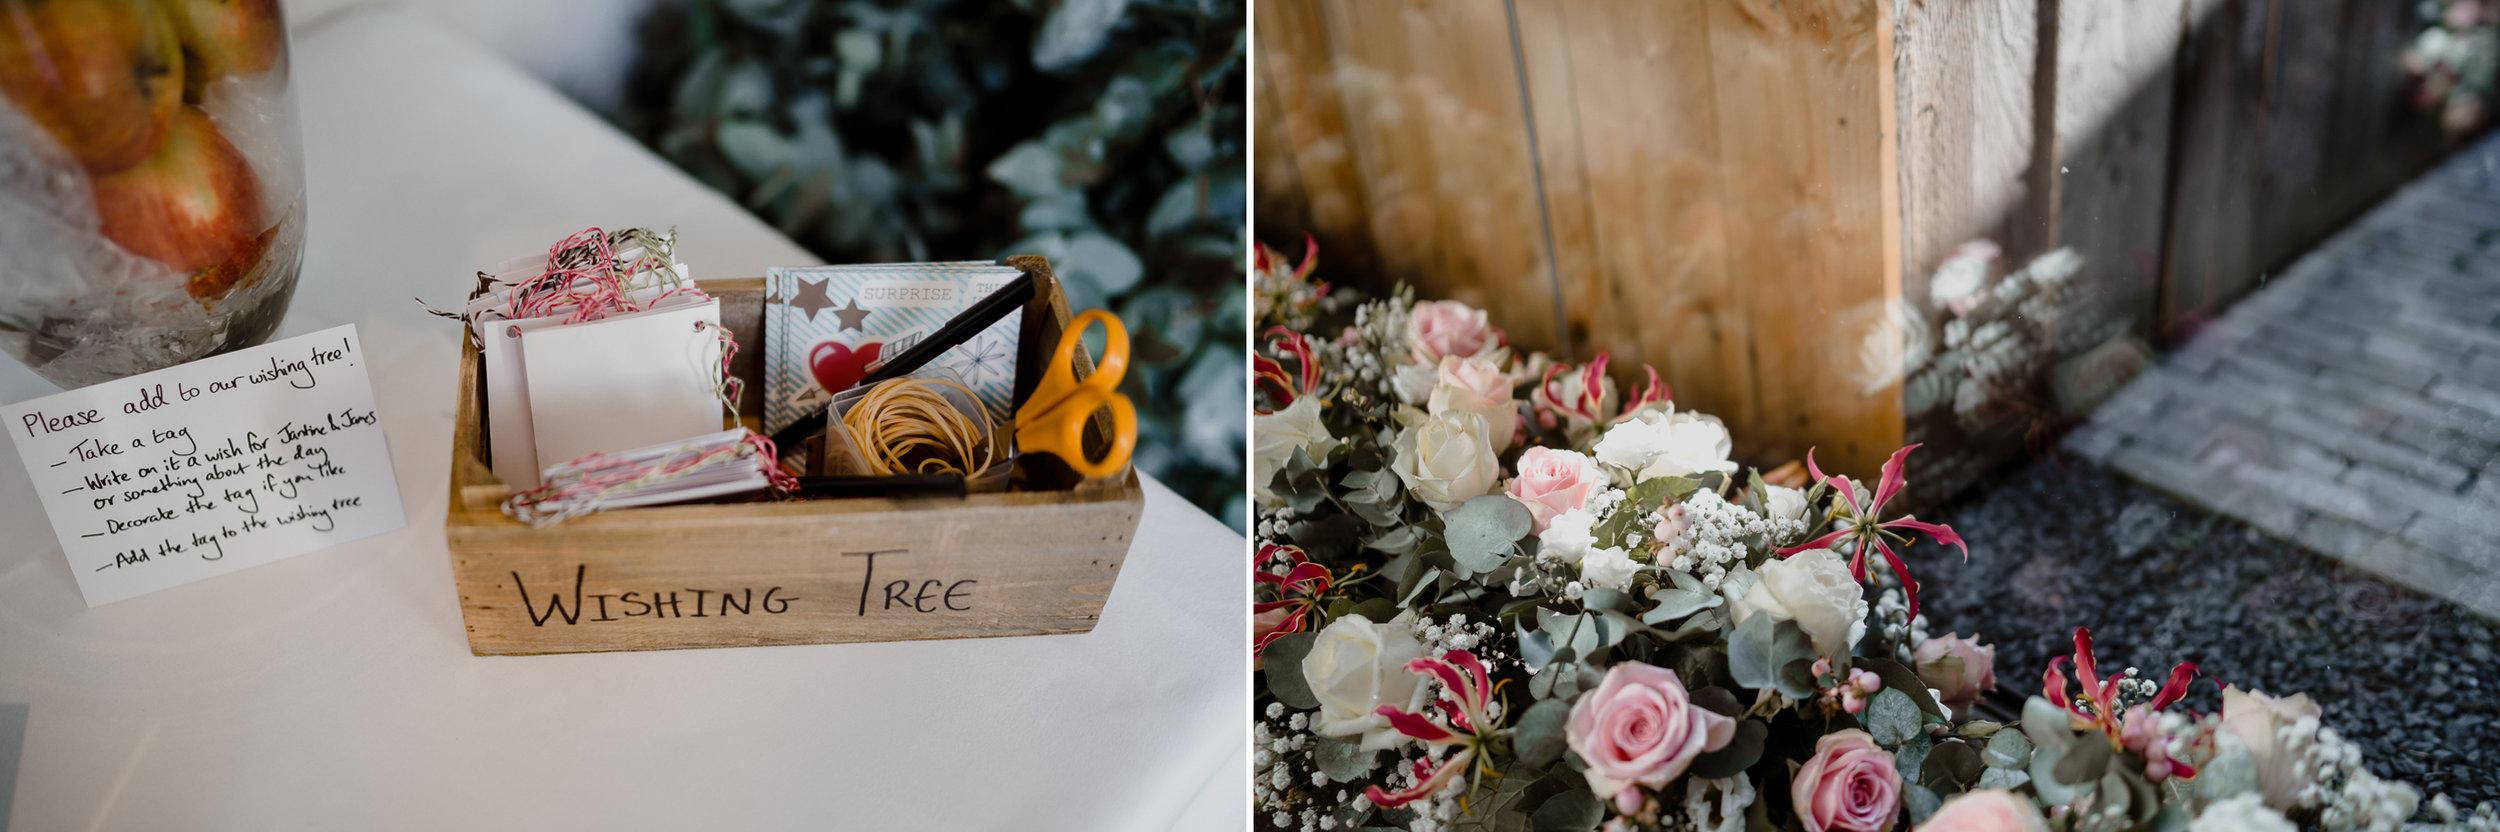 bruidsfotografie-trouwfotograaf-wedding-photographer-amsterdam-James-Jantine-314 copy.jpg